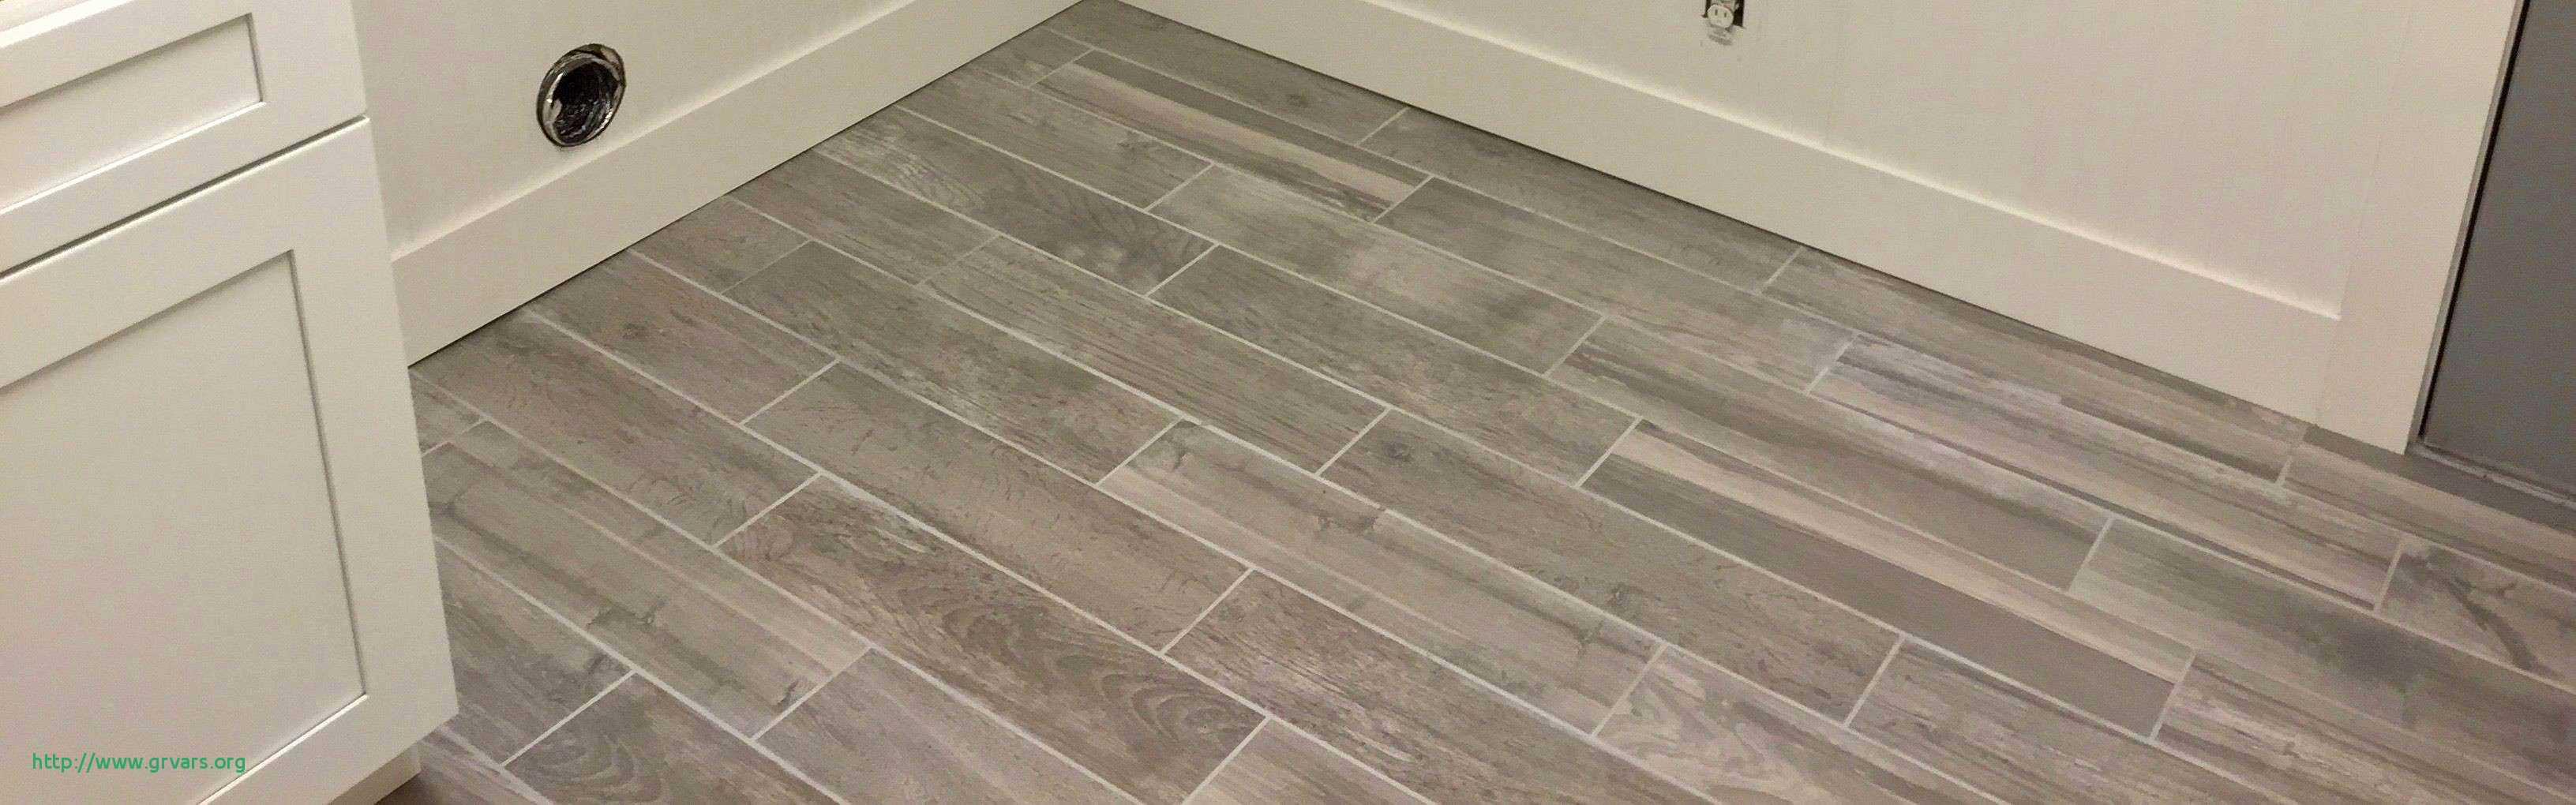 hardwood vinyl sheet flooring of 15 charmant lanolium flooring ideas blog with regard to lanolium flooring beau linoleum flooring using vinyl flooring walls stock a collection